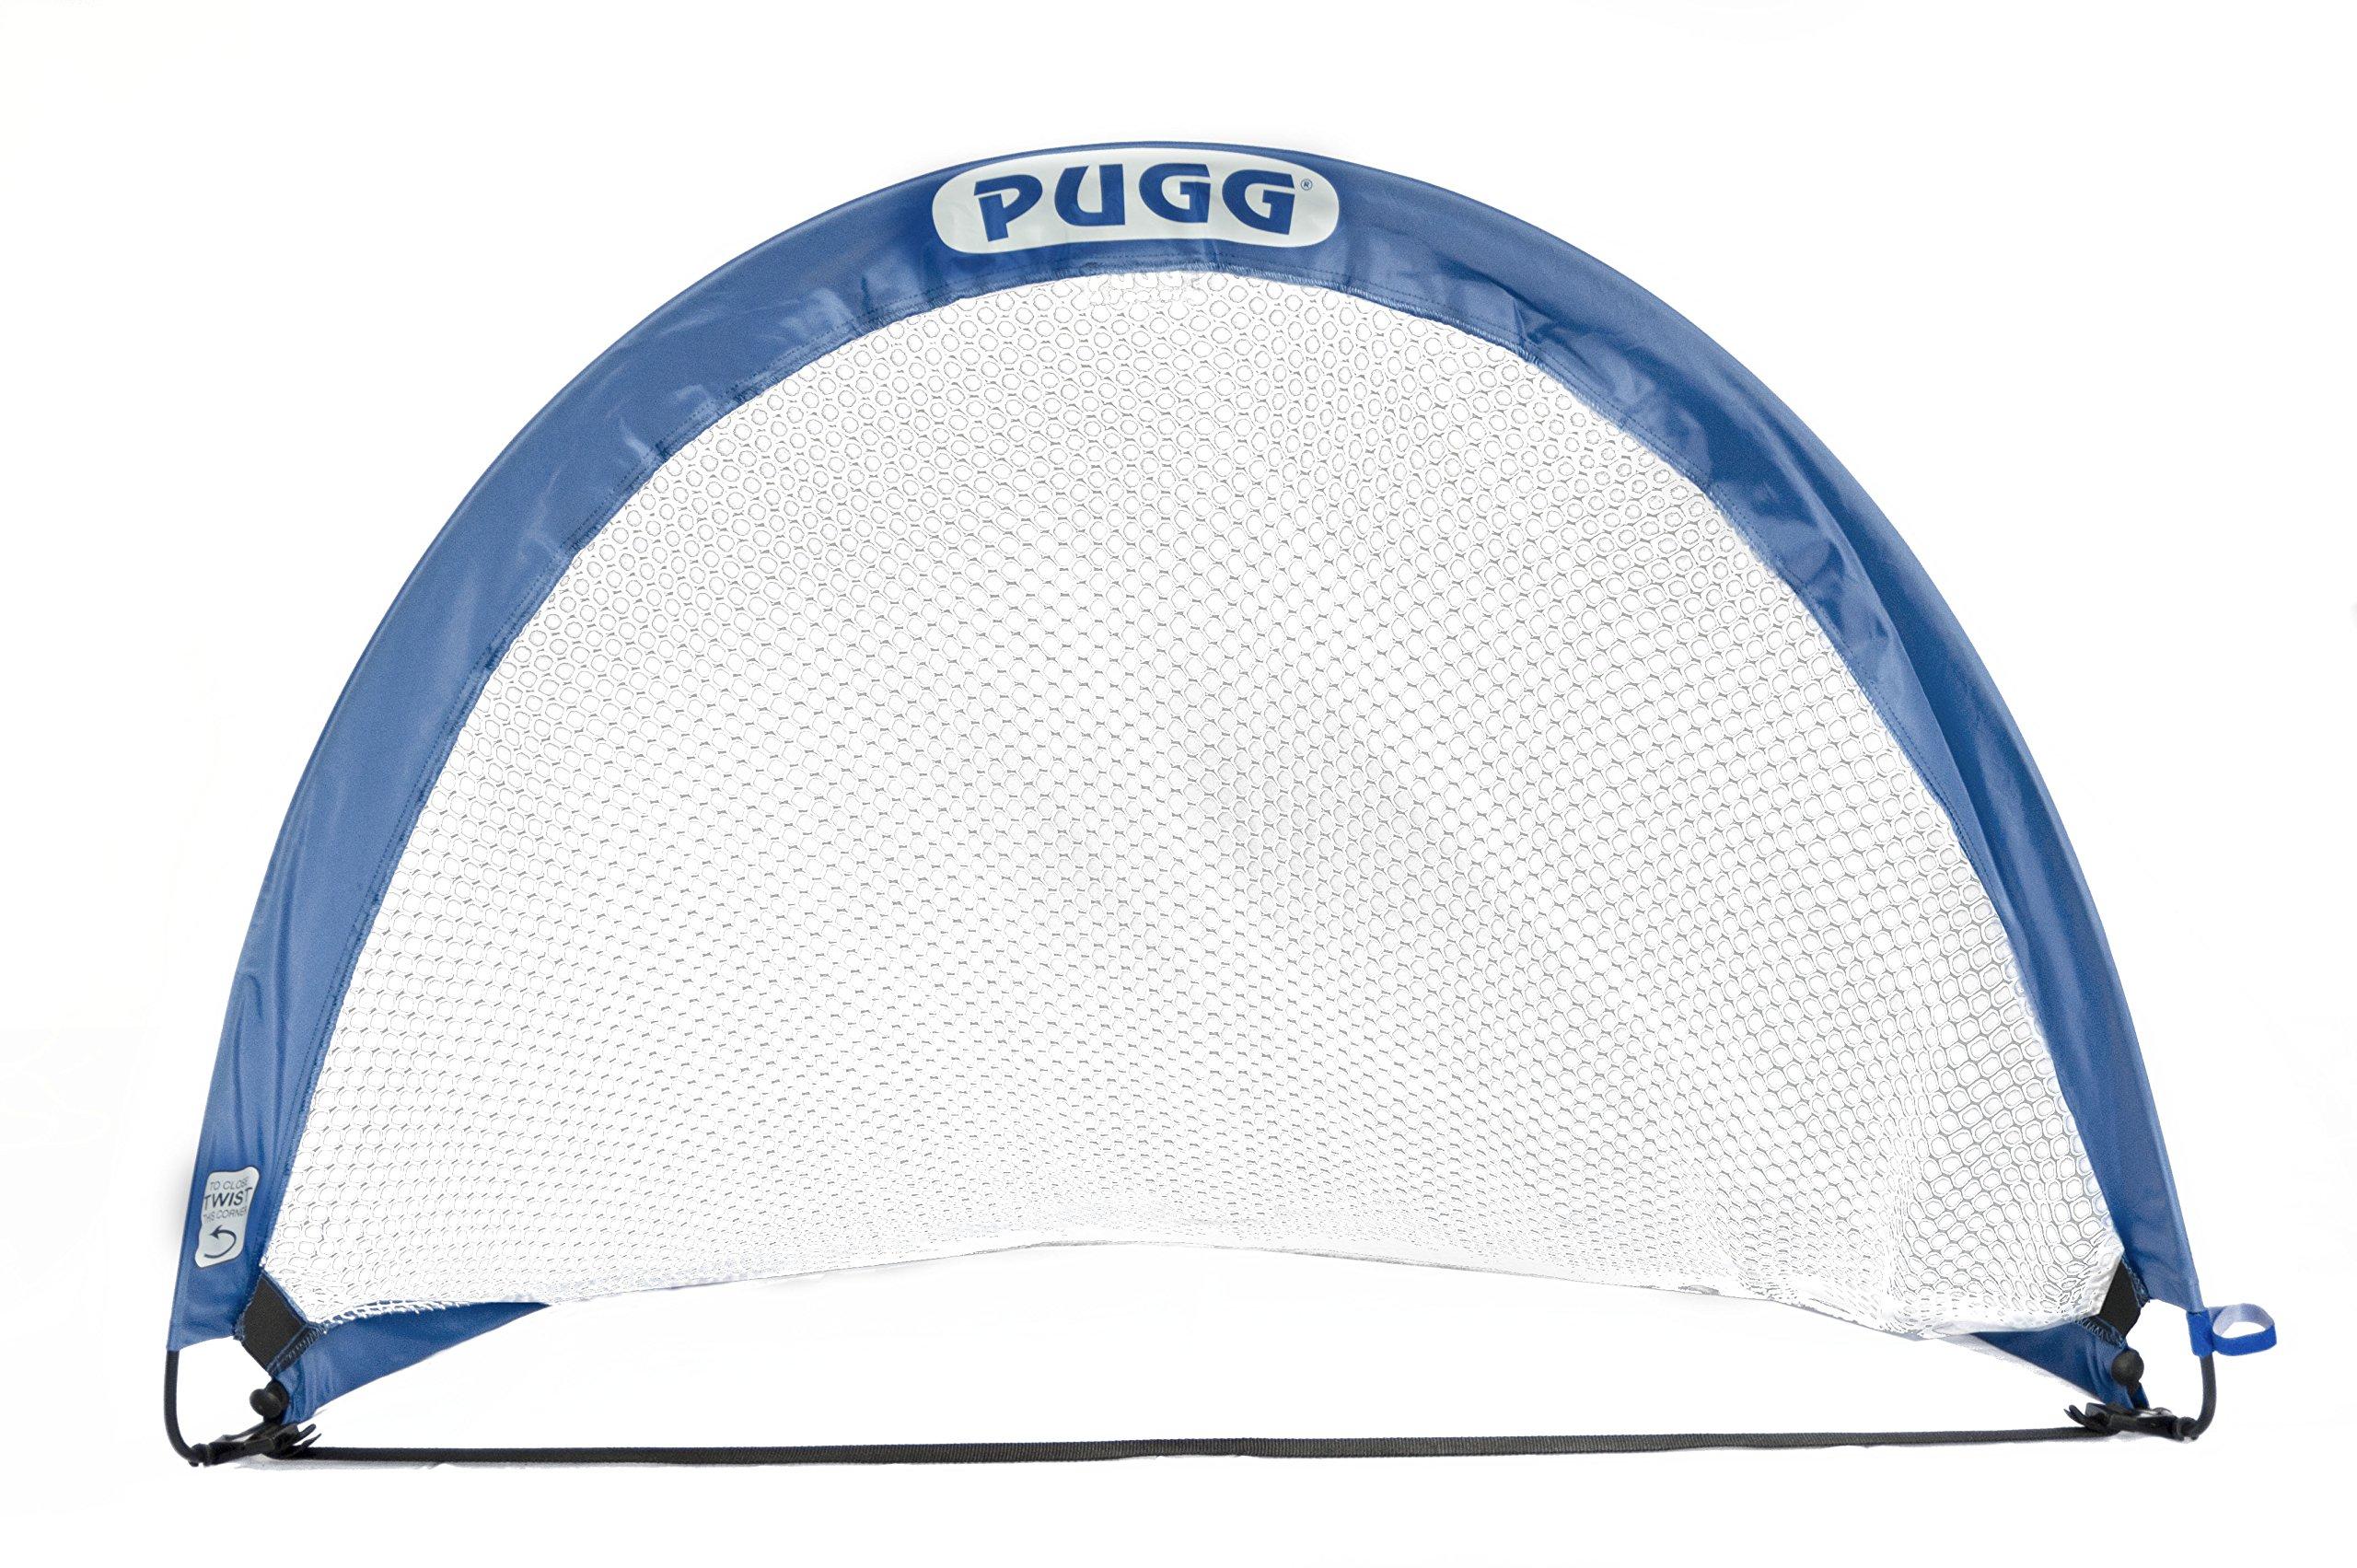 pugg 4 foot pop up soccer goal portable training futsal. Black Bedroom Furniture Sets. Home Design Ideas